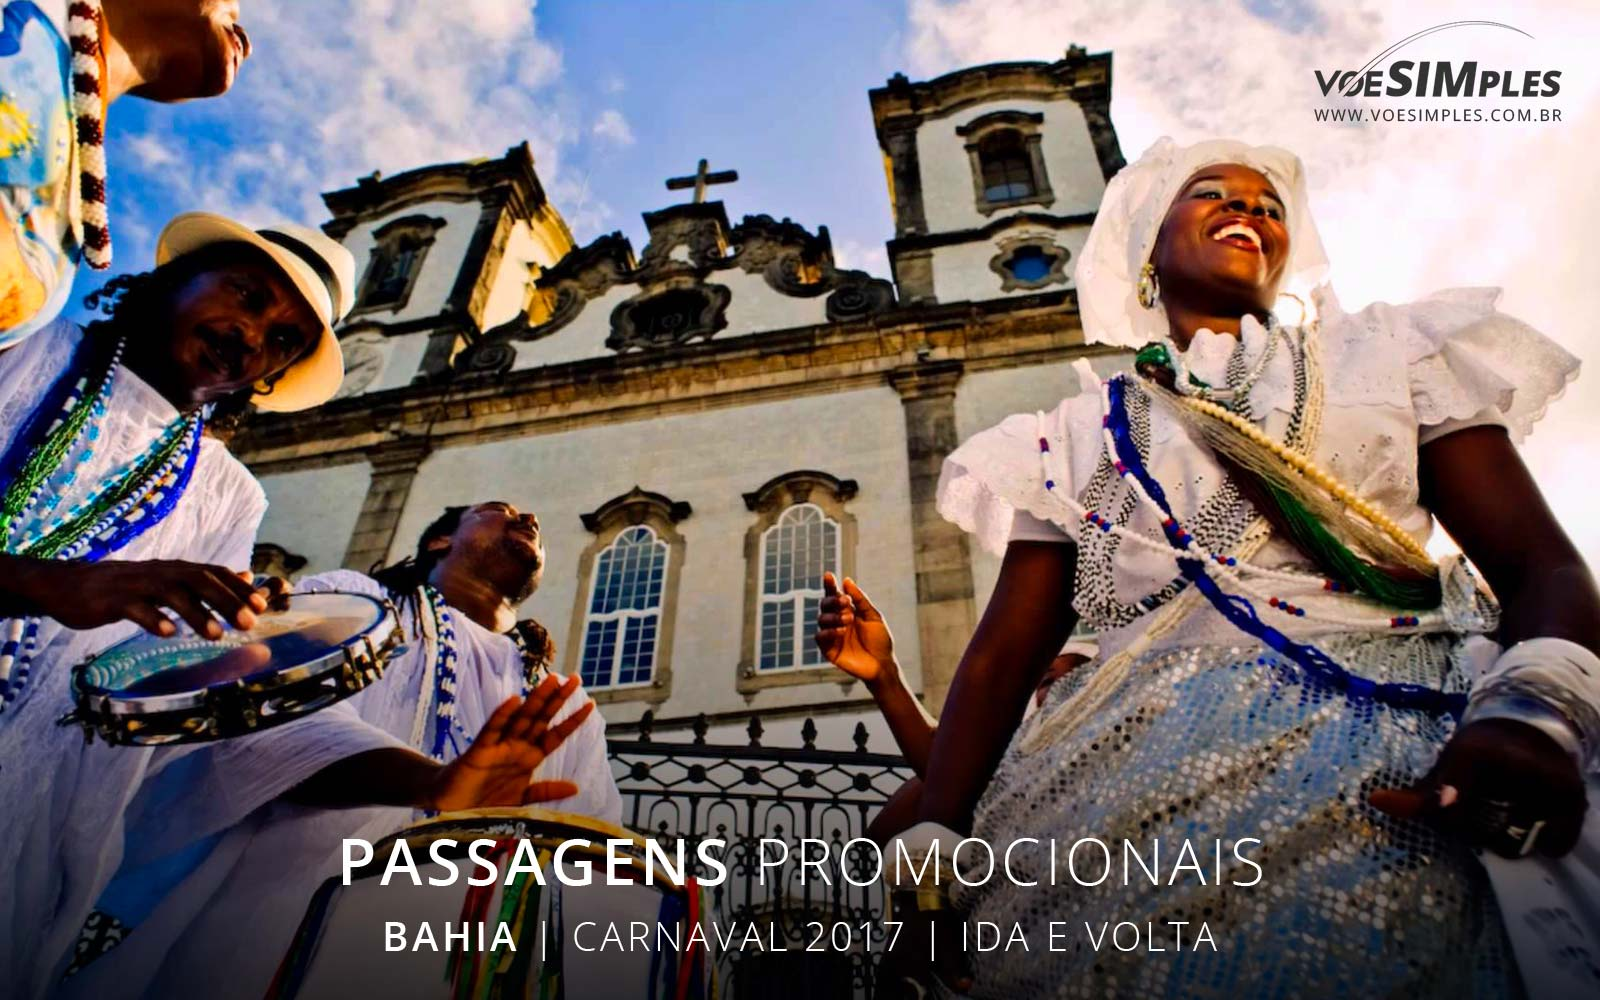 Passagens aéreas baratas para carnaval 2017